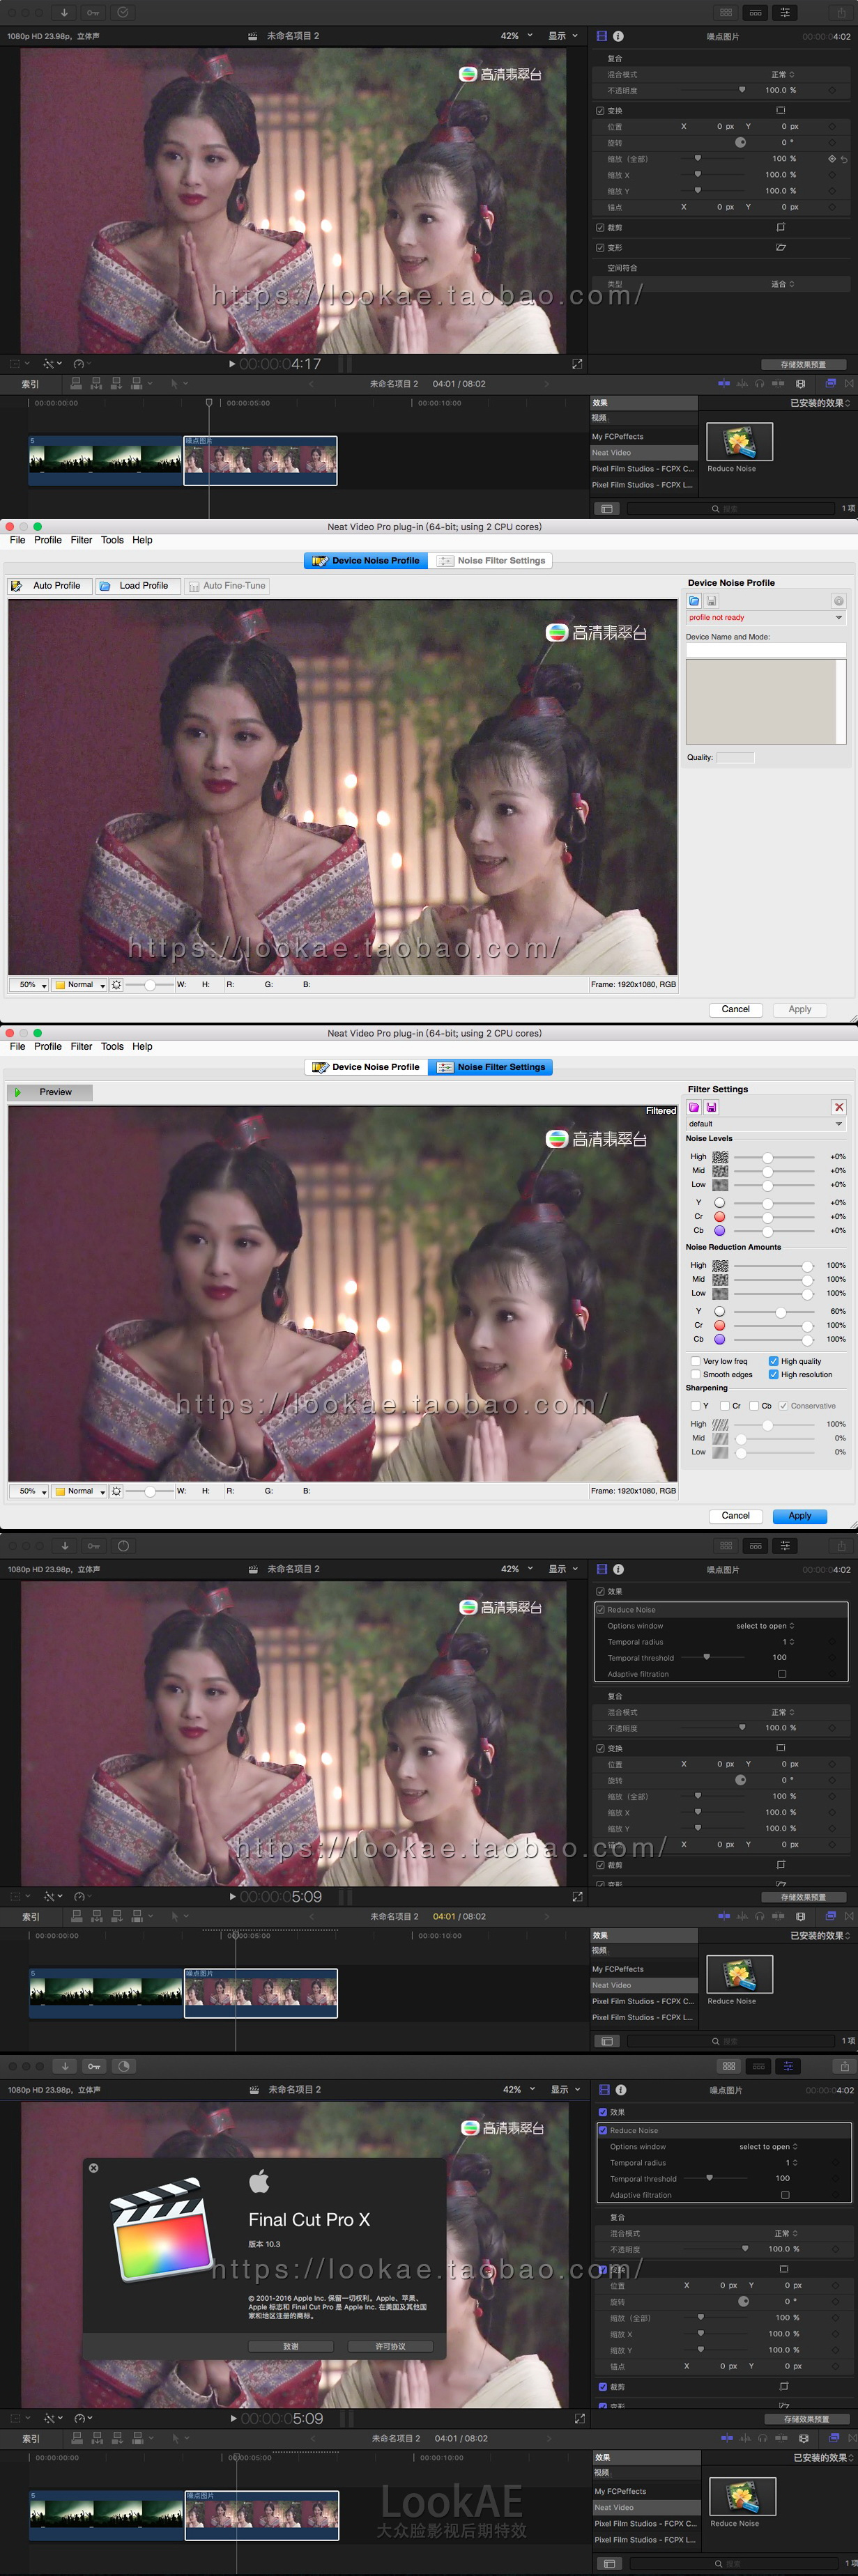 FCP7/FCPX 专业视频降噪插件 Neat Video 支持 FCPX 10.3 + 使用教程 FCPX 插件-第2张